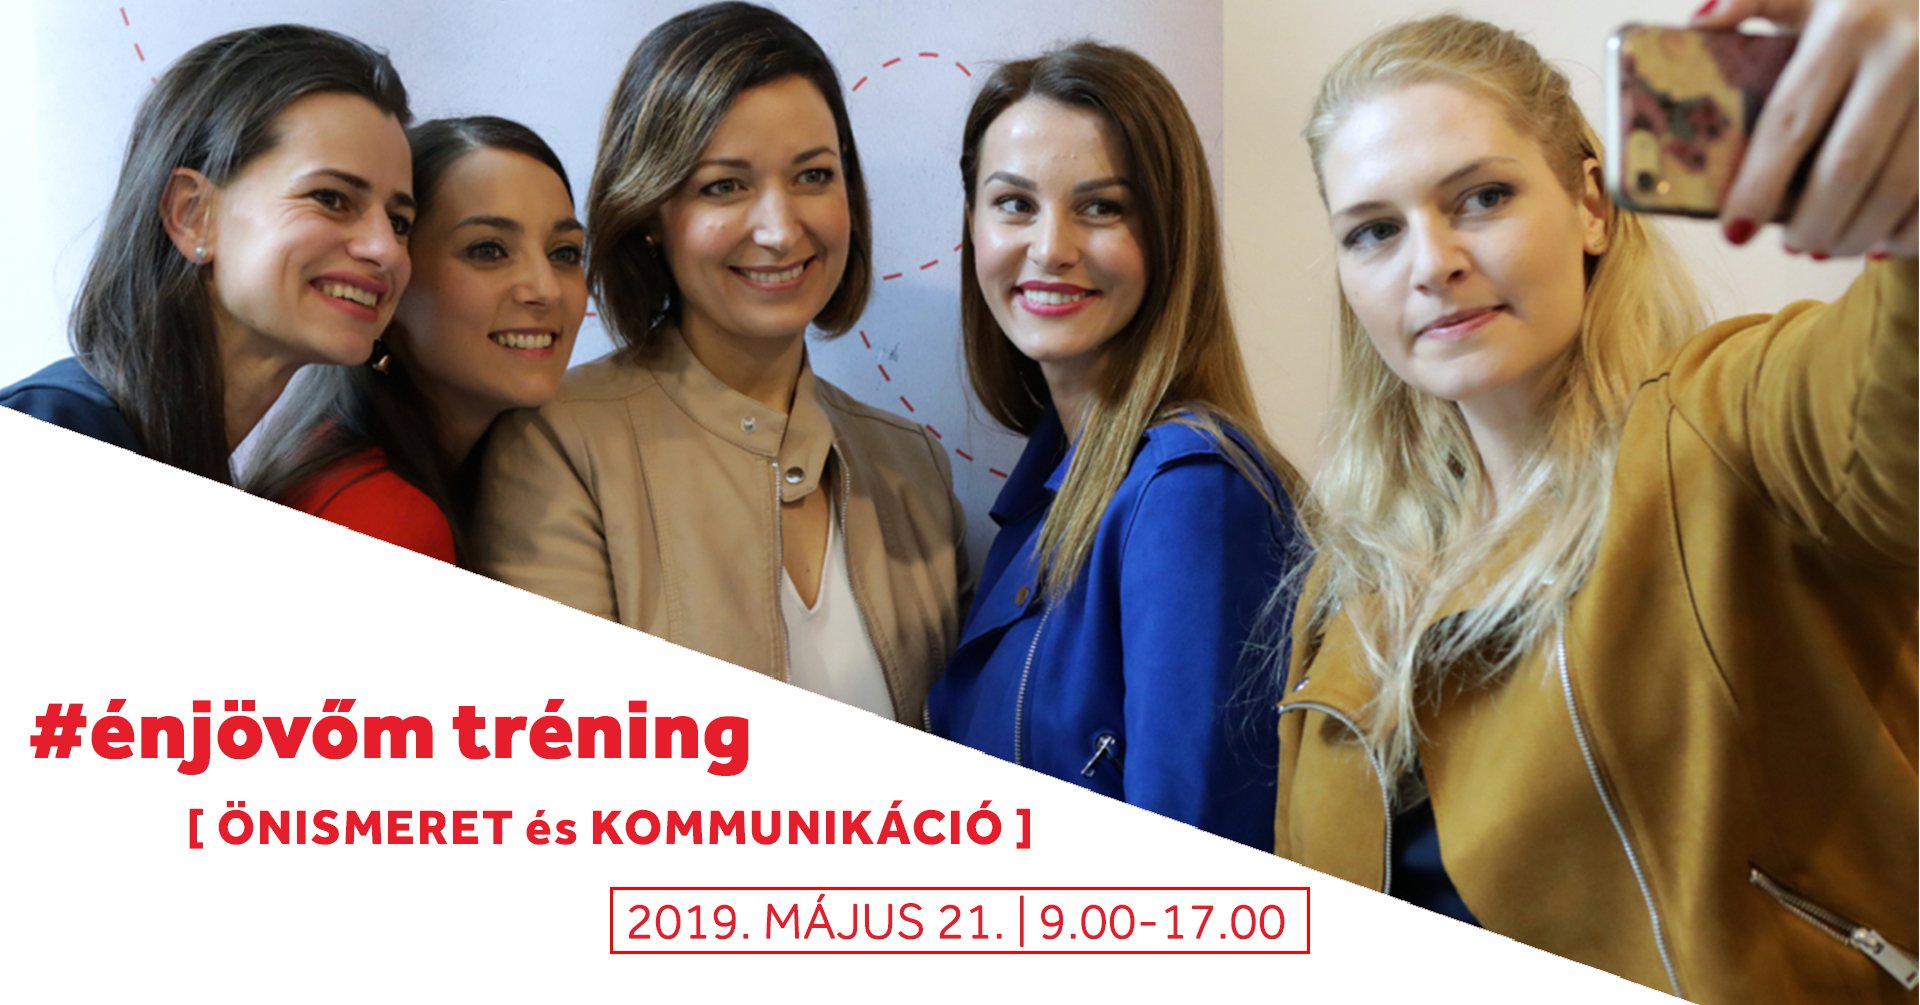 enjovom_trening_2019_05_21.jpg